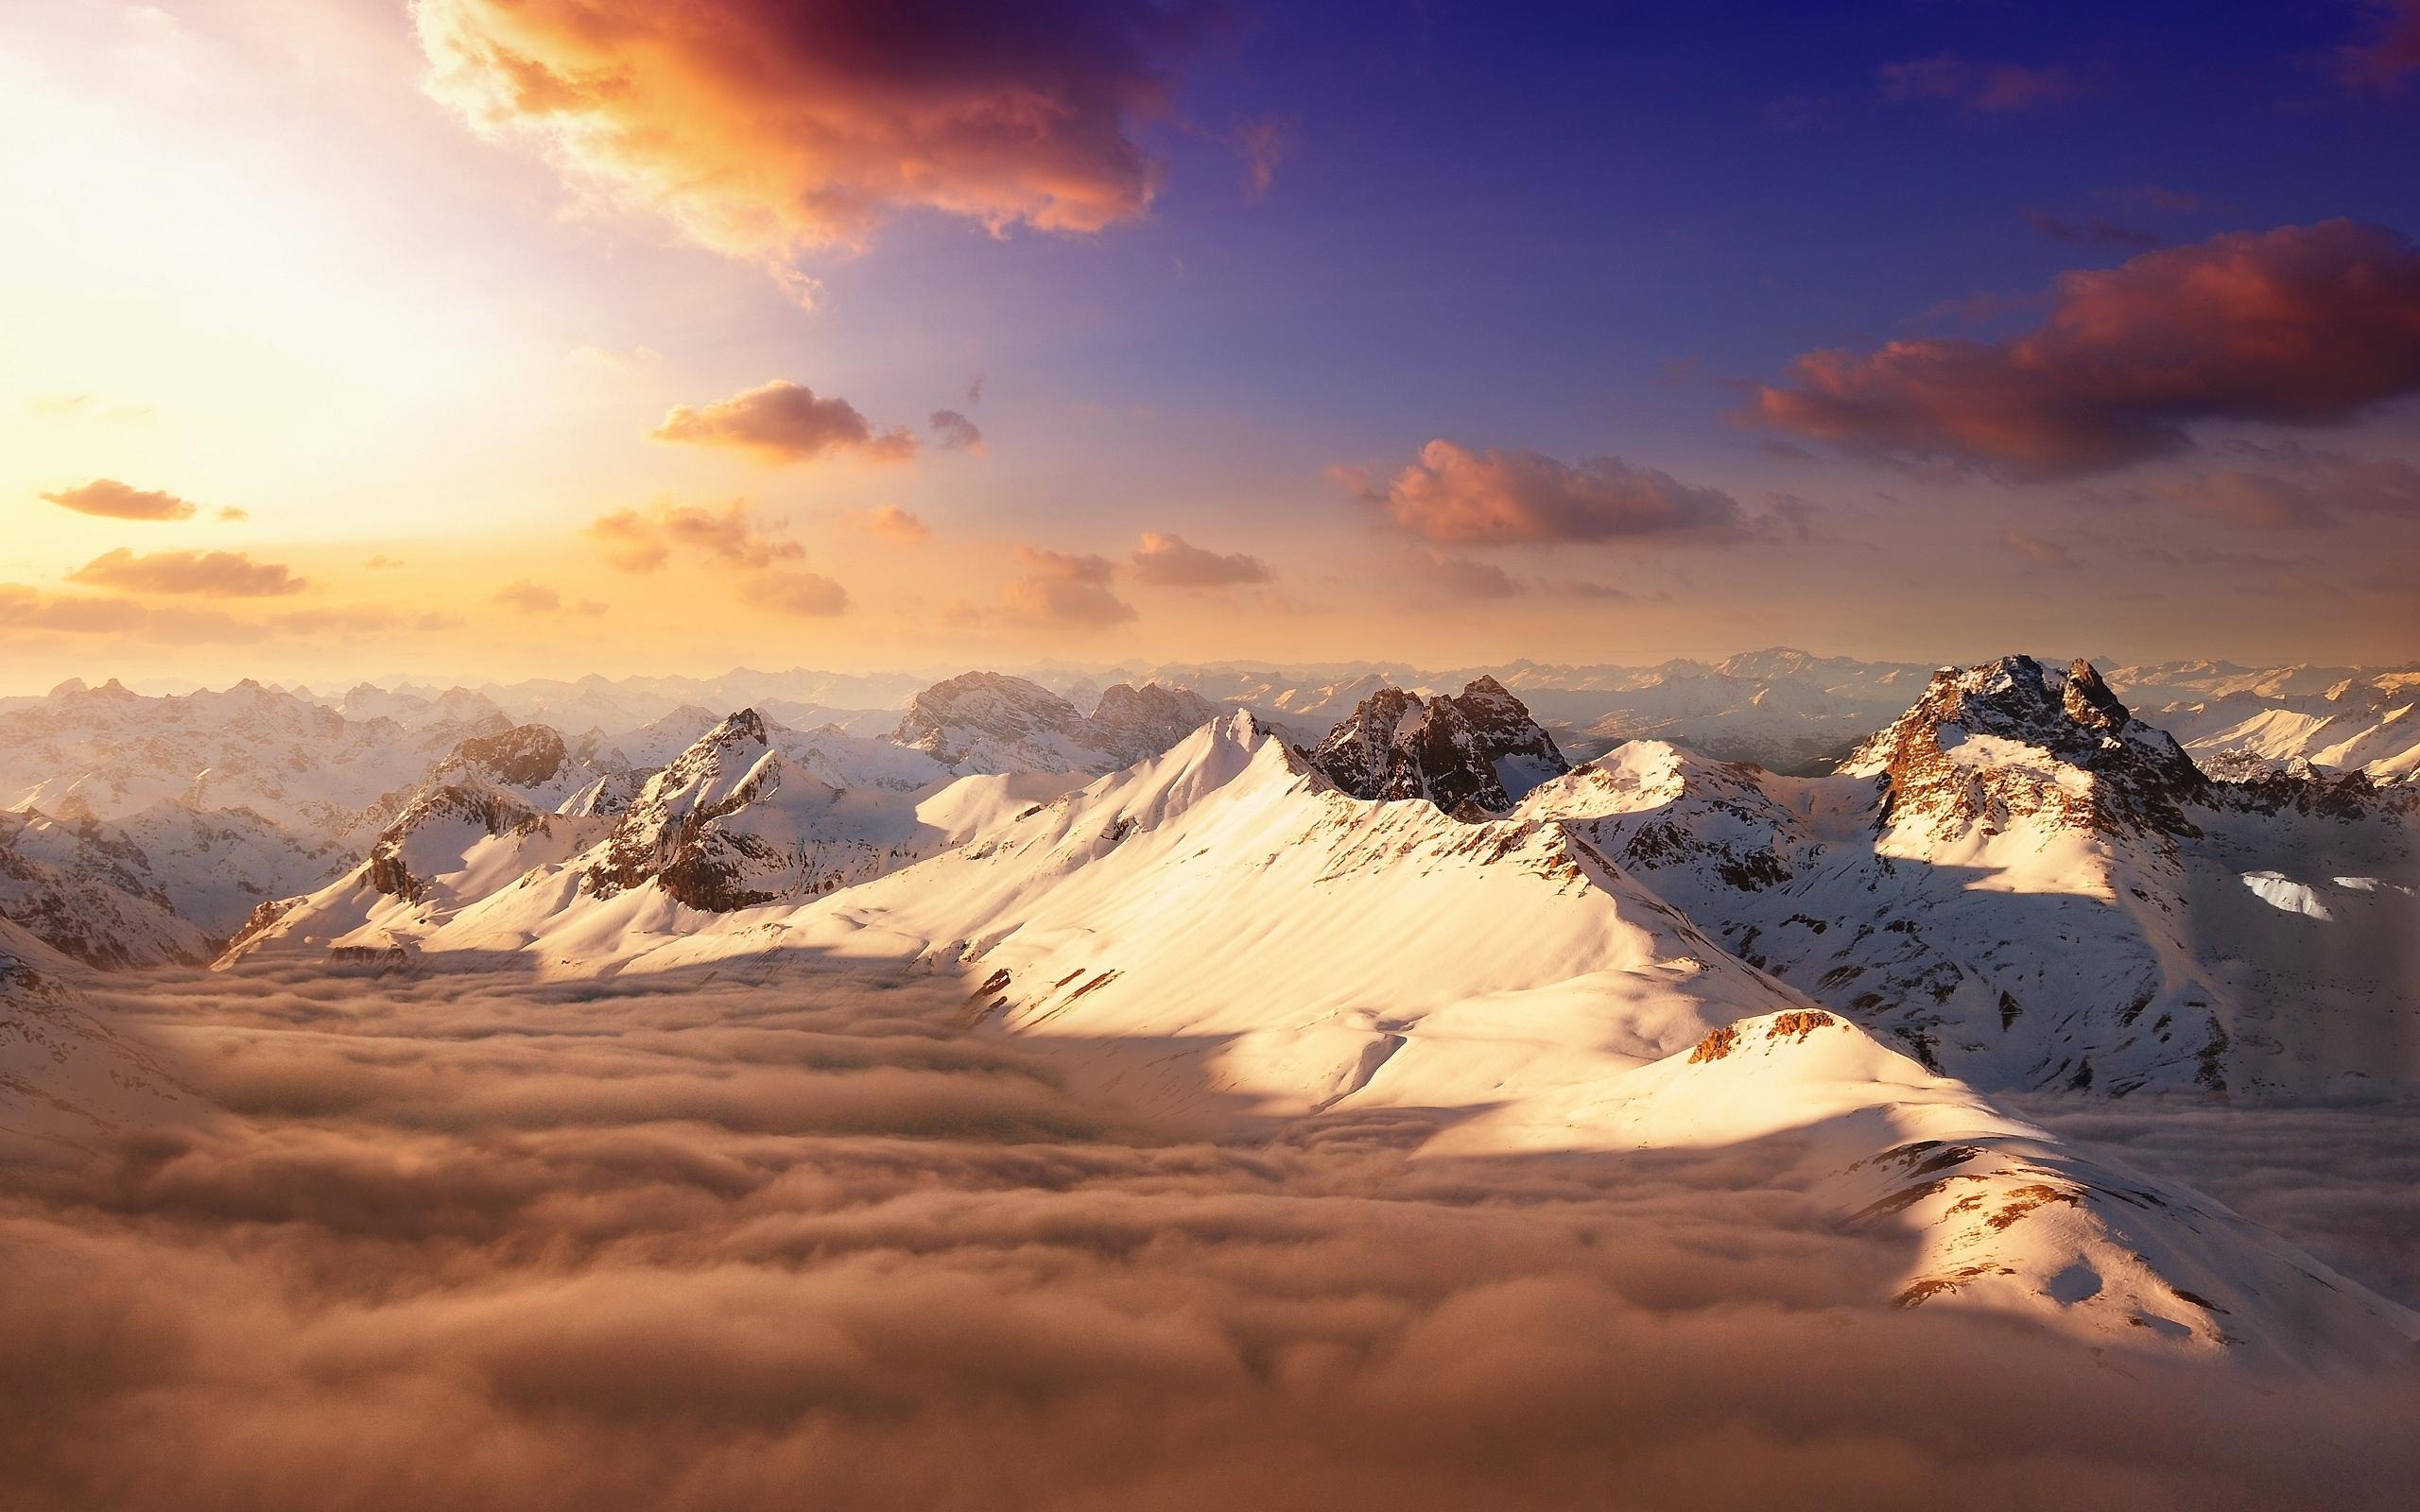 Mountains sky sunset